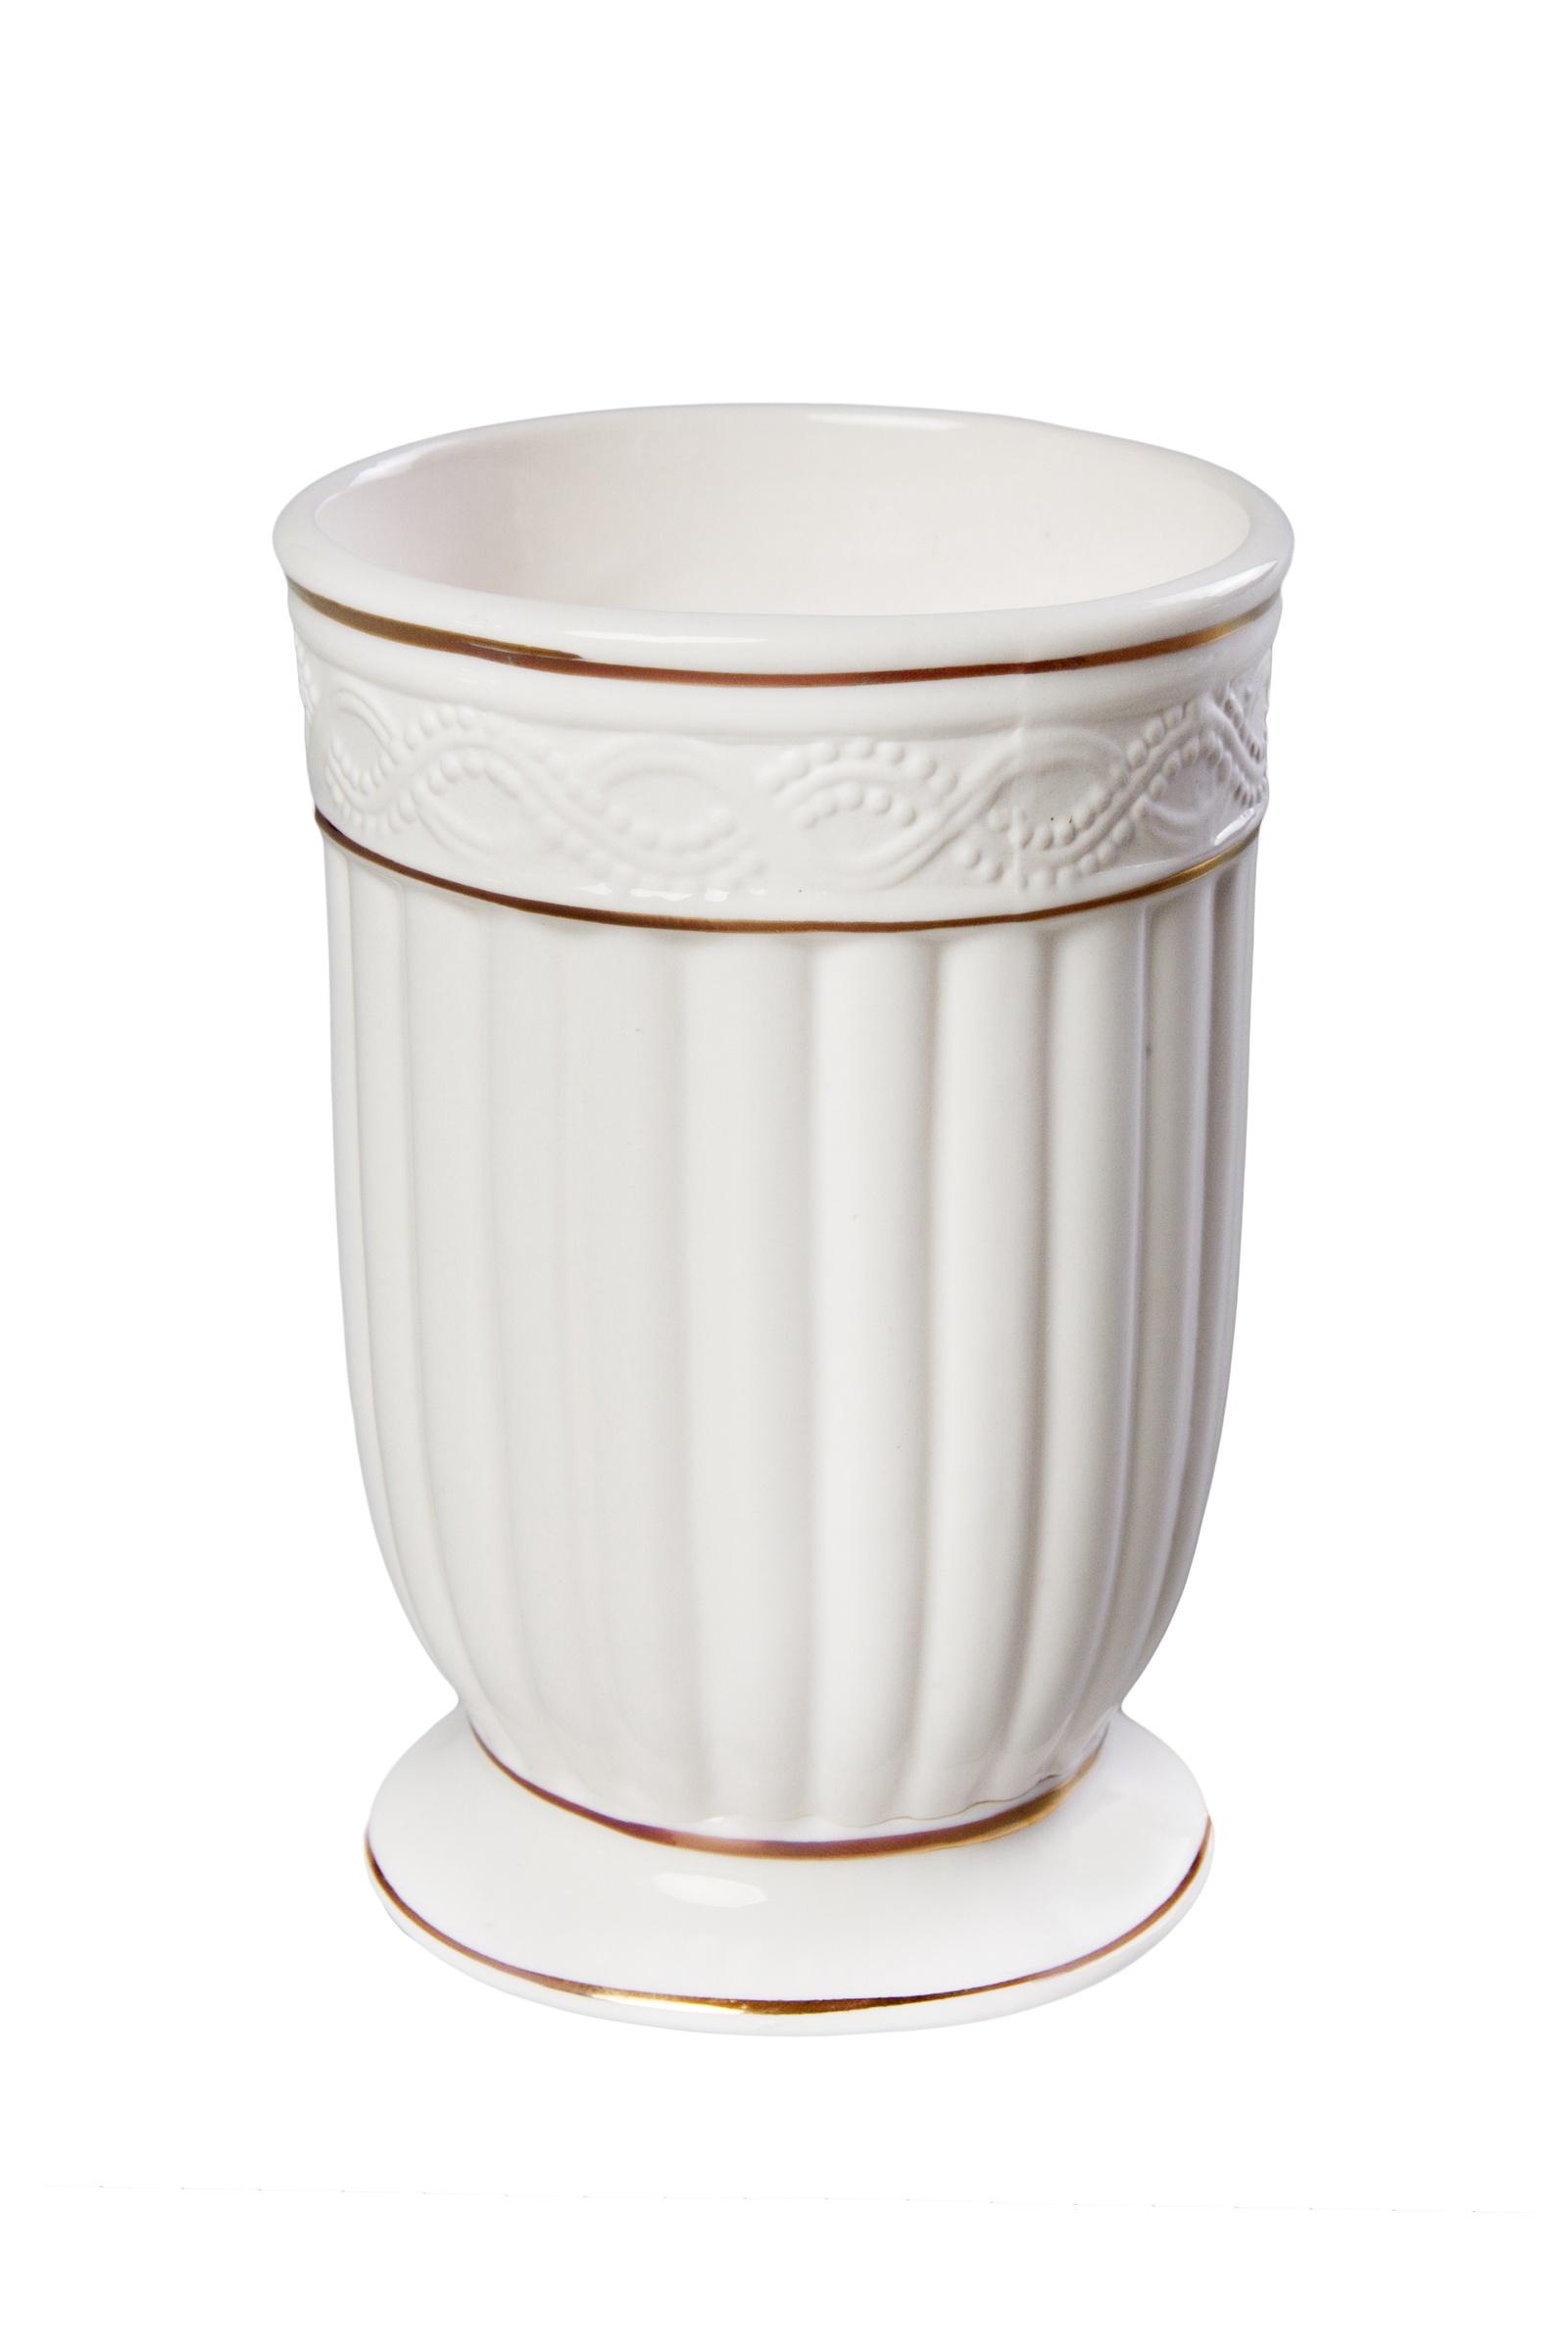 Стакан для ванной комнаты Vanstore Стакан для ванной, белый, золотой стакан для ванной комнаты vanstore wiki бирюзовый